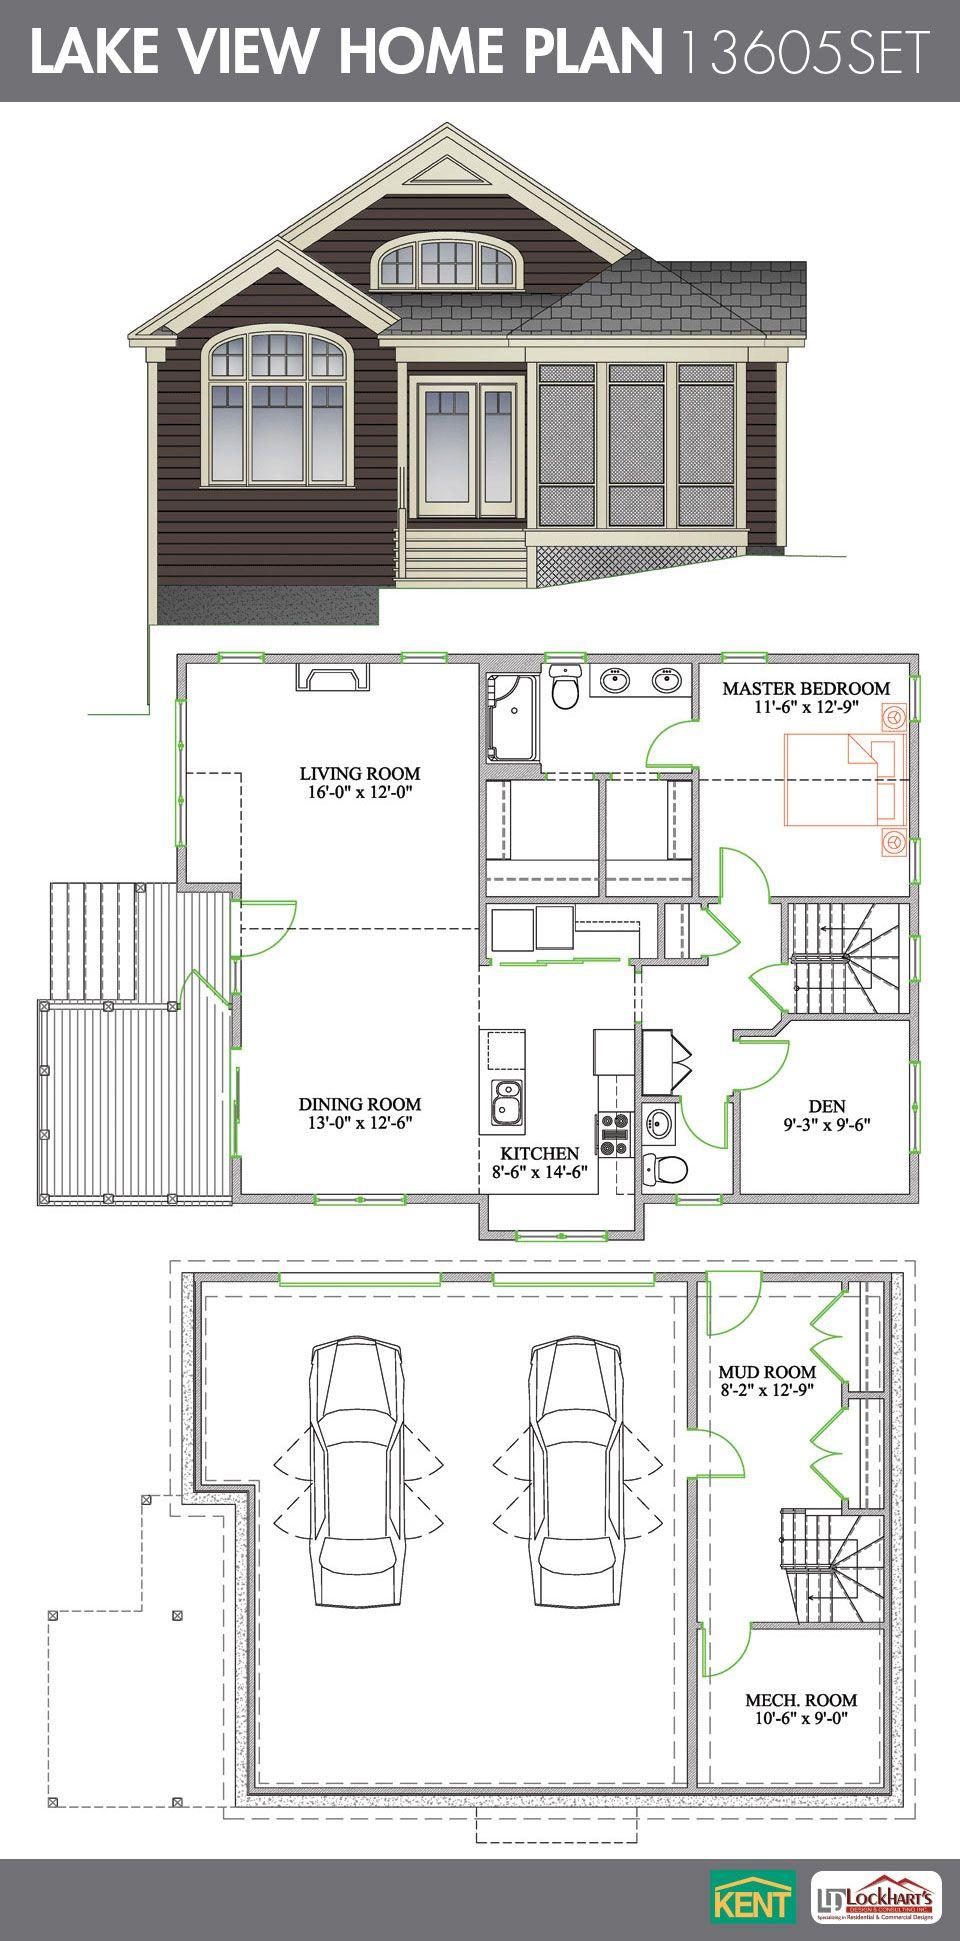 Lake View Home Plan Kent Building Supplies House Plans Bungalow House Plans Small Bathroom Plans